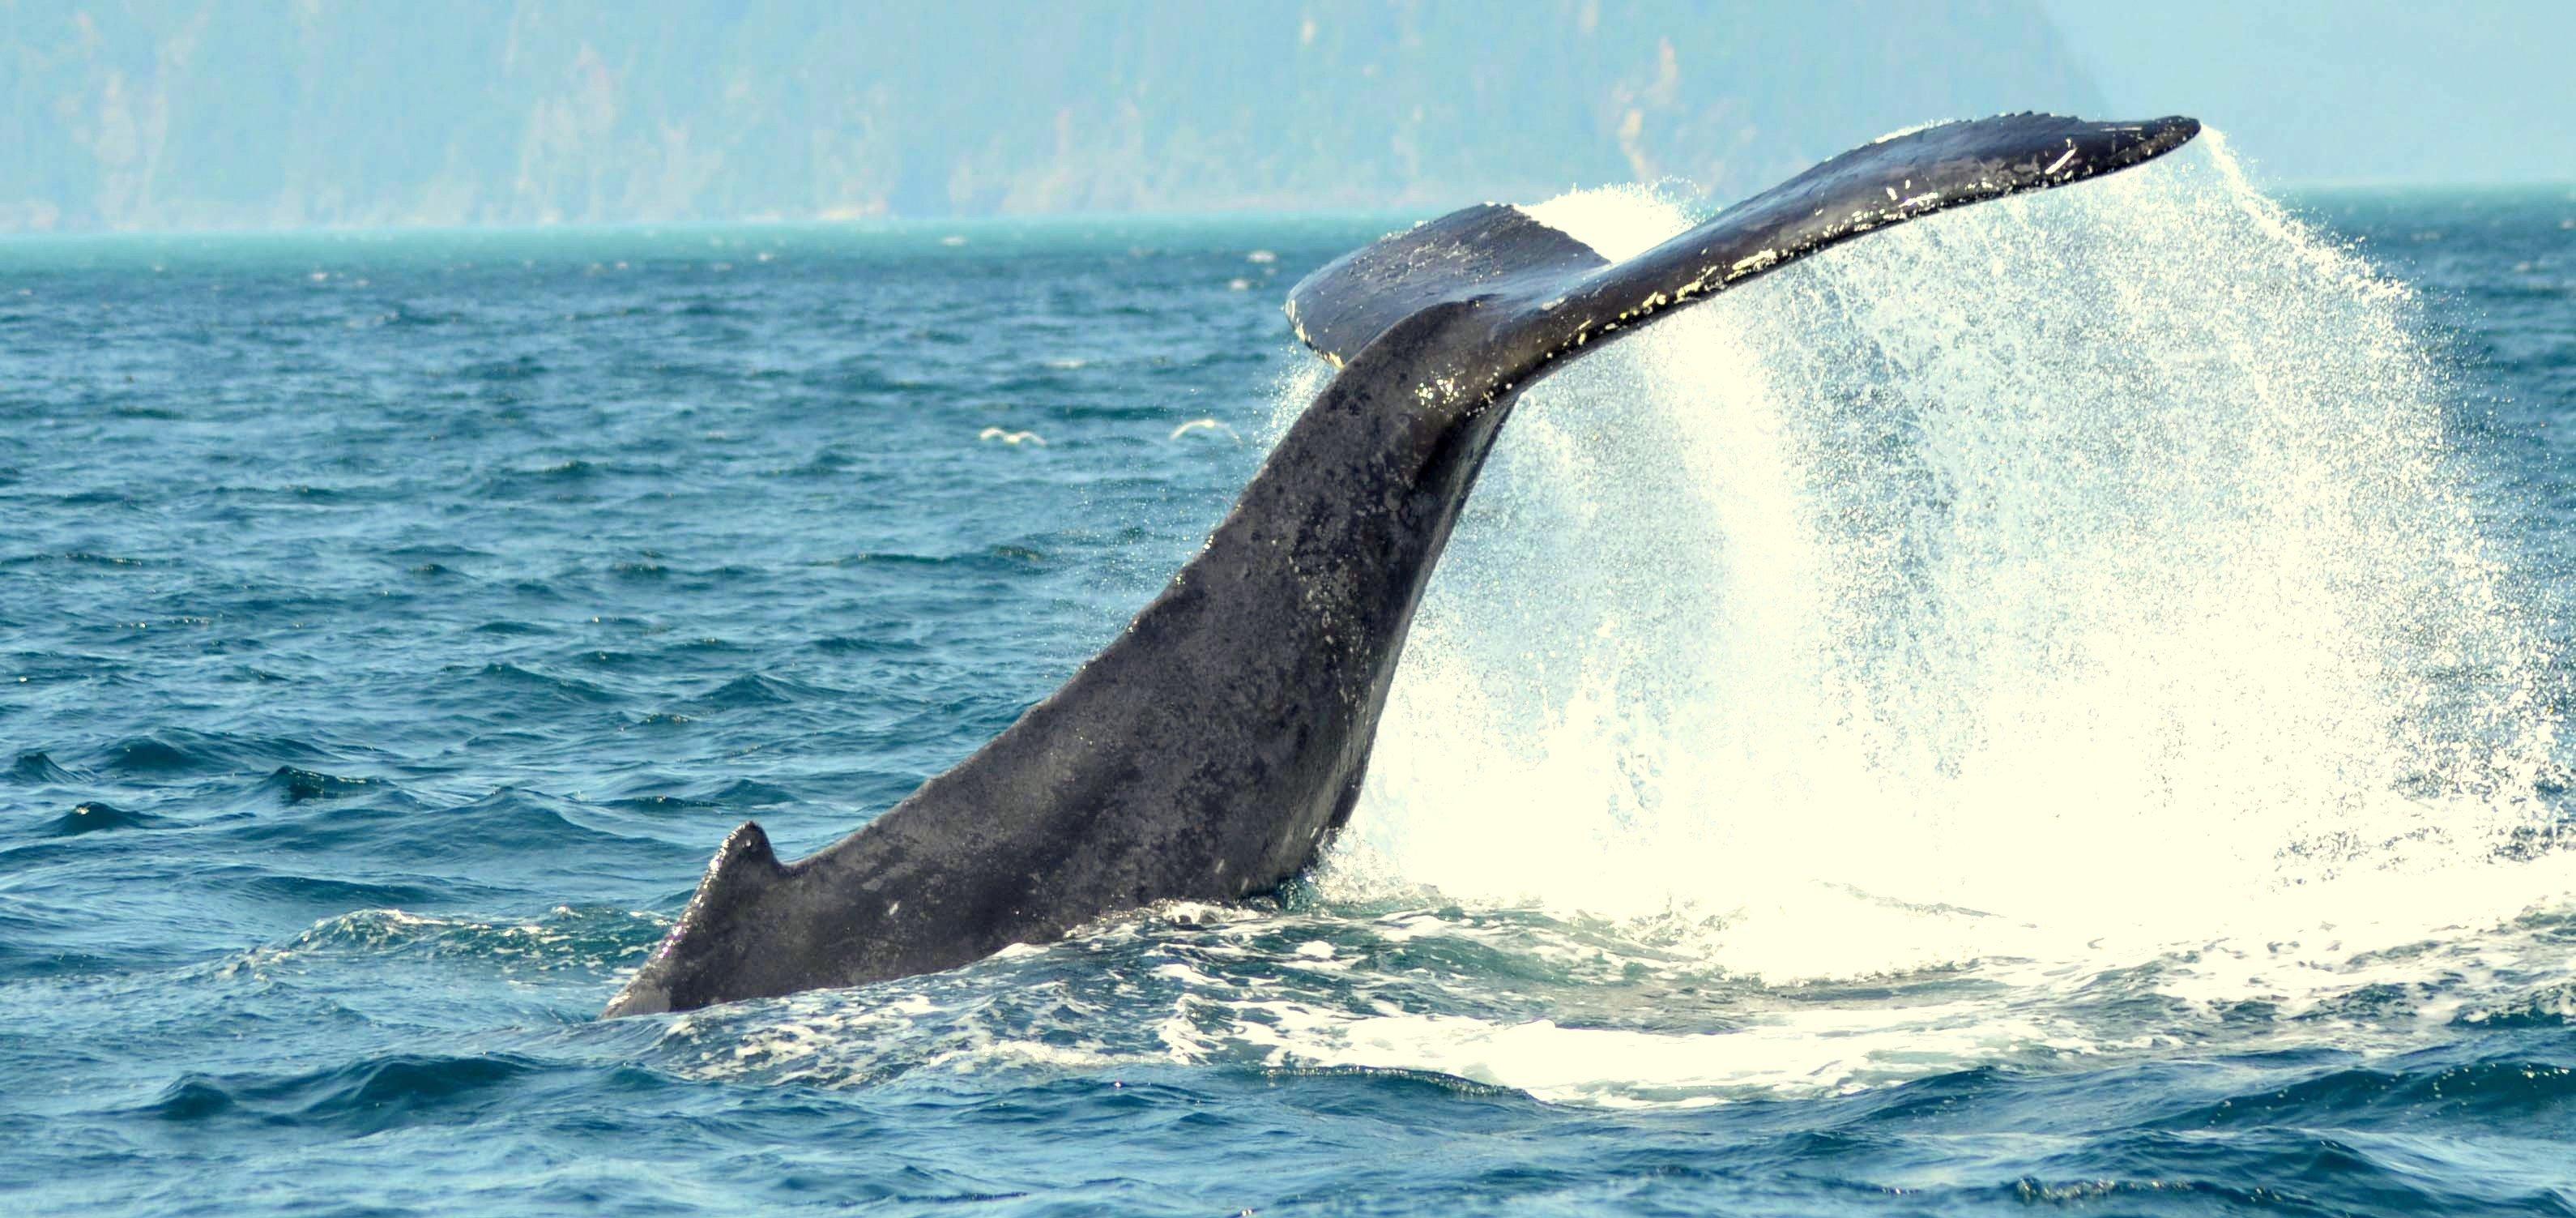 09-NLA-Whale-Tail-3